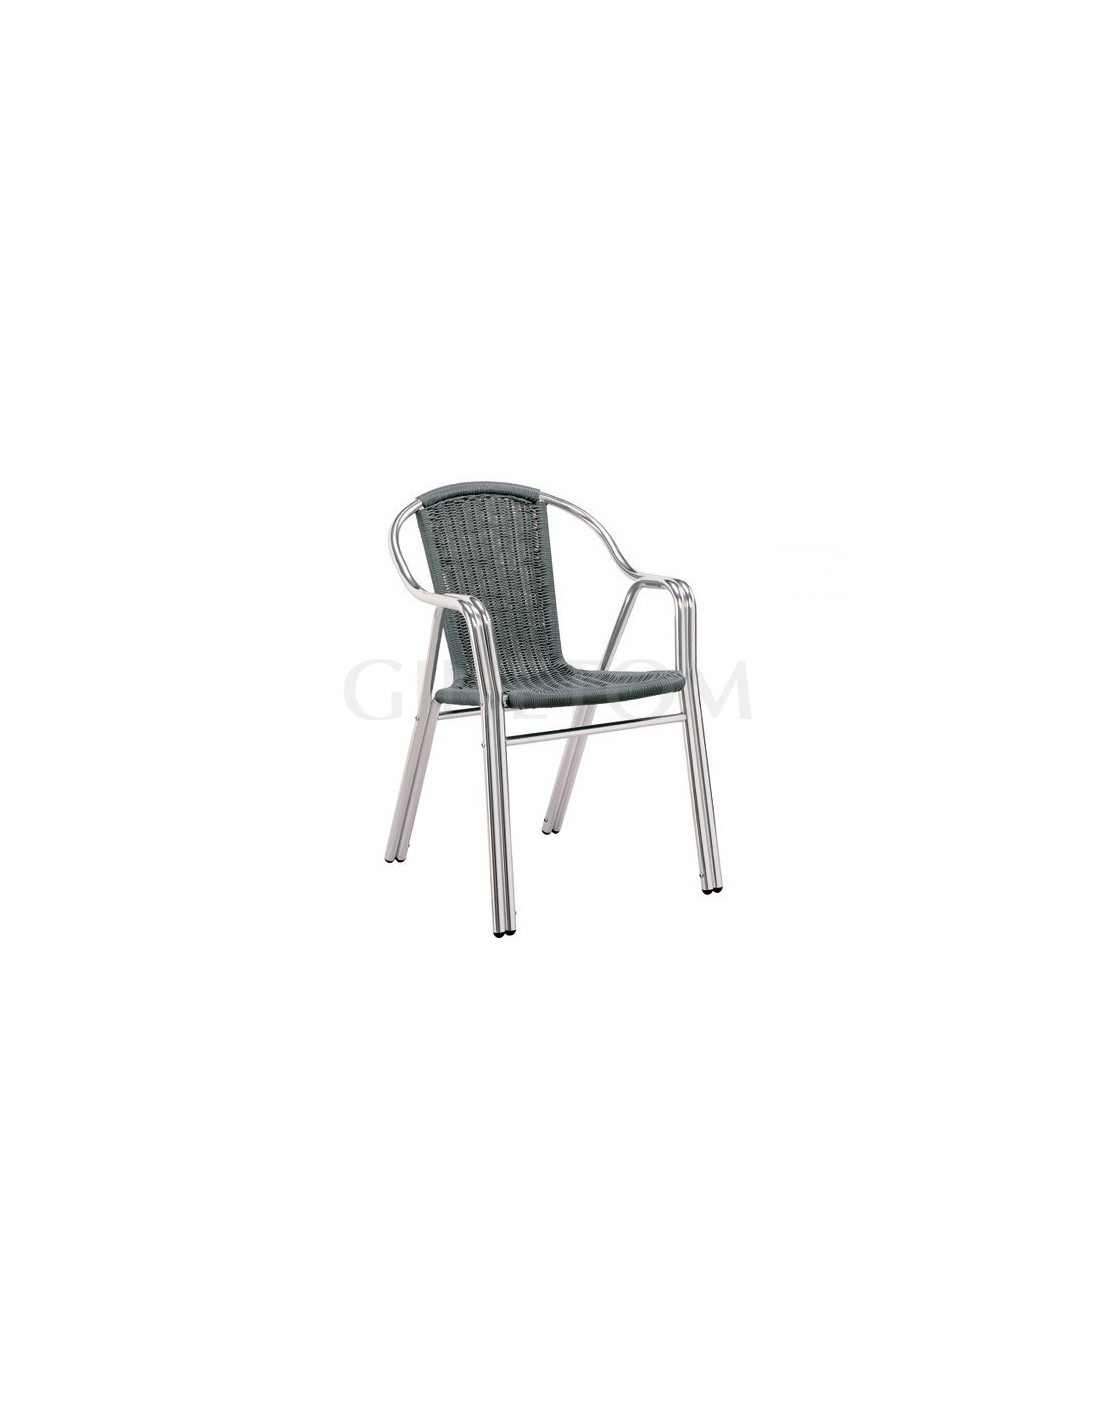 Silla de aluminio pe especial hosteleria - Sillas de aluminio ...